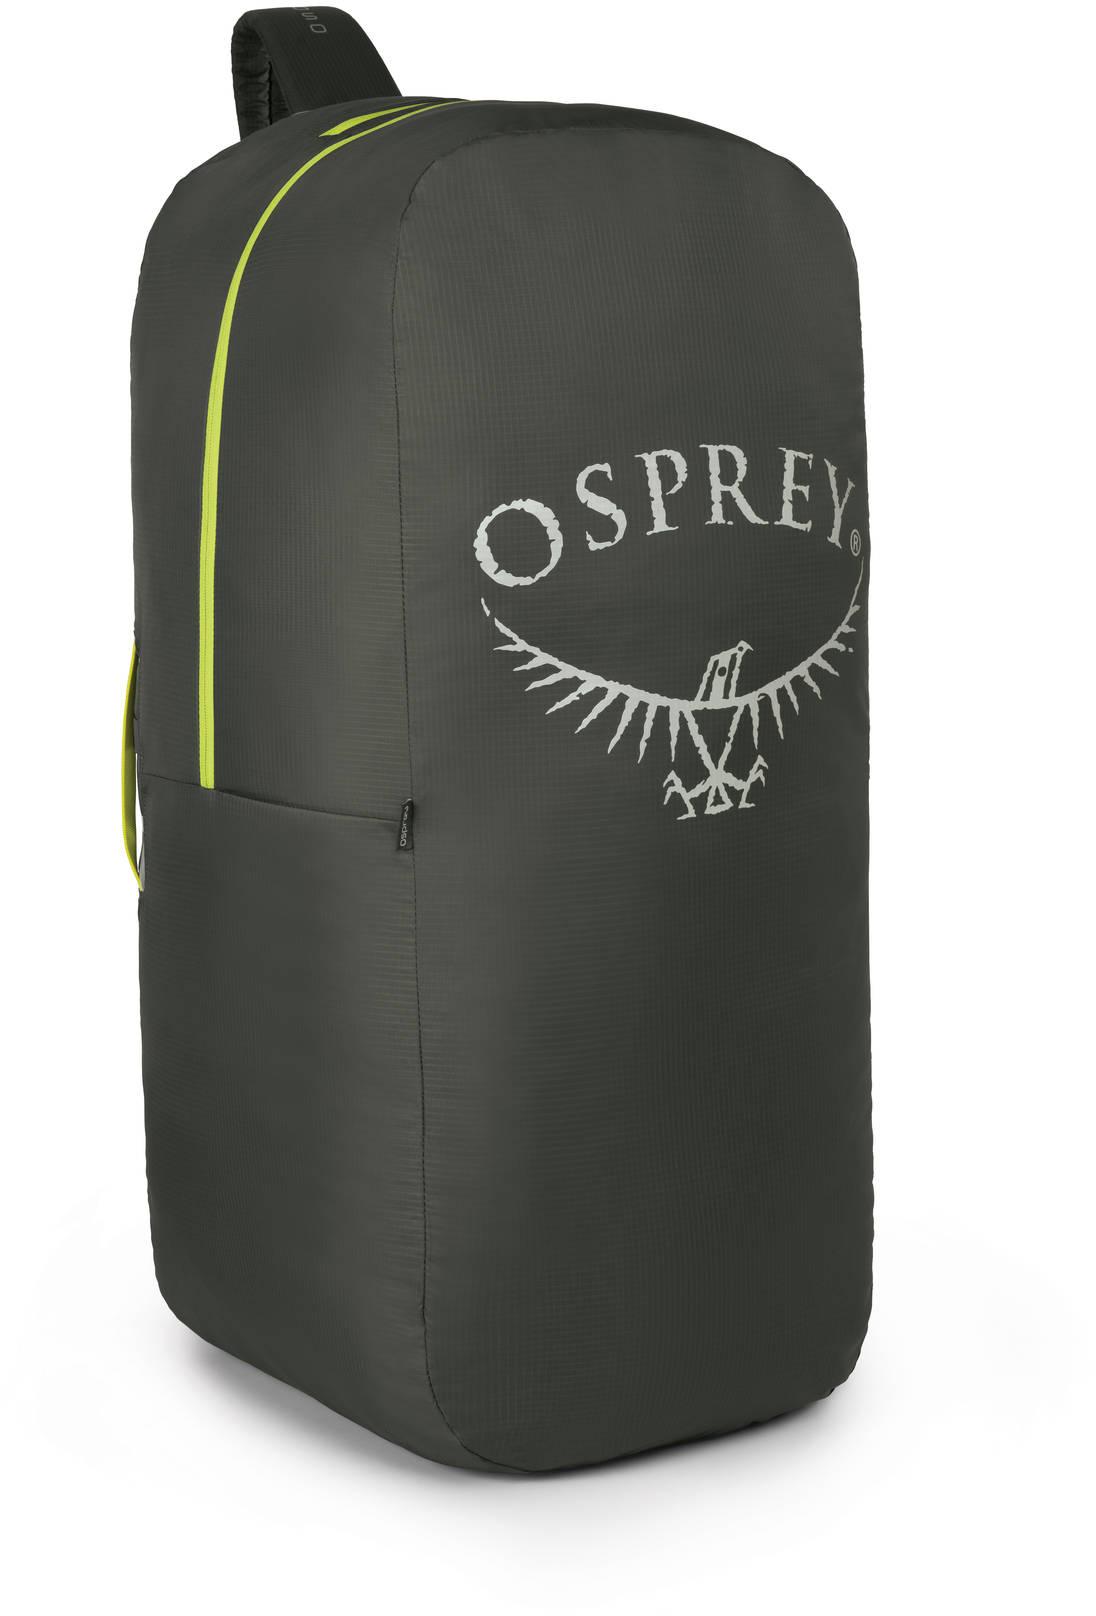 Аксессуары Чехол на рюкзак Osprey Airporter S (10-50л) Airporter_Side_Shadow_Grey_web.jpg